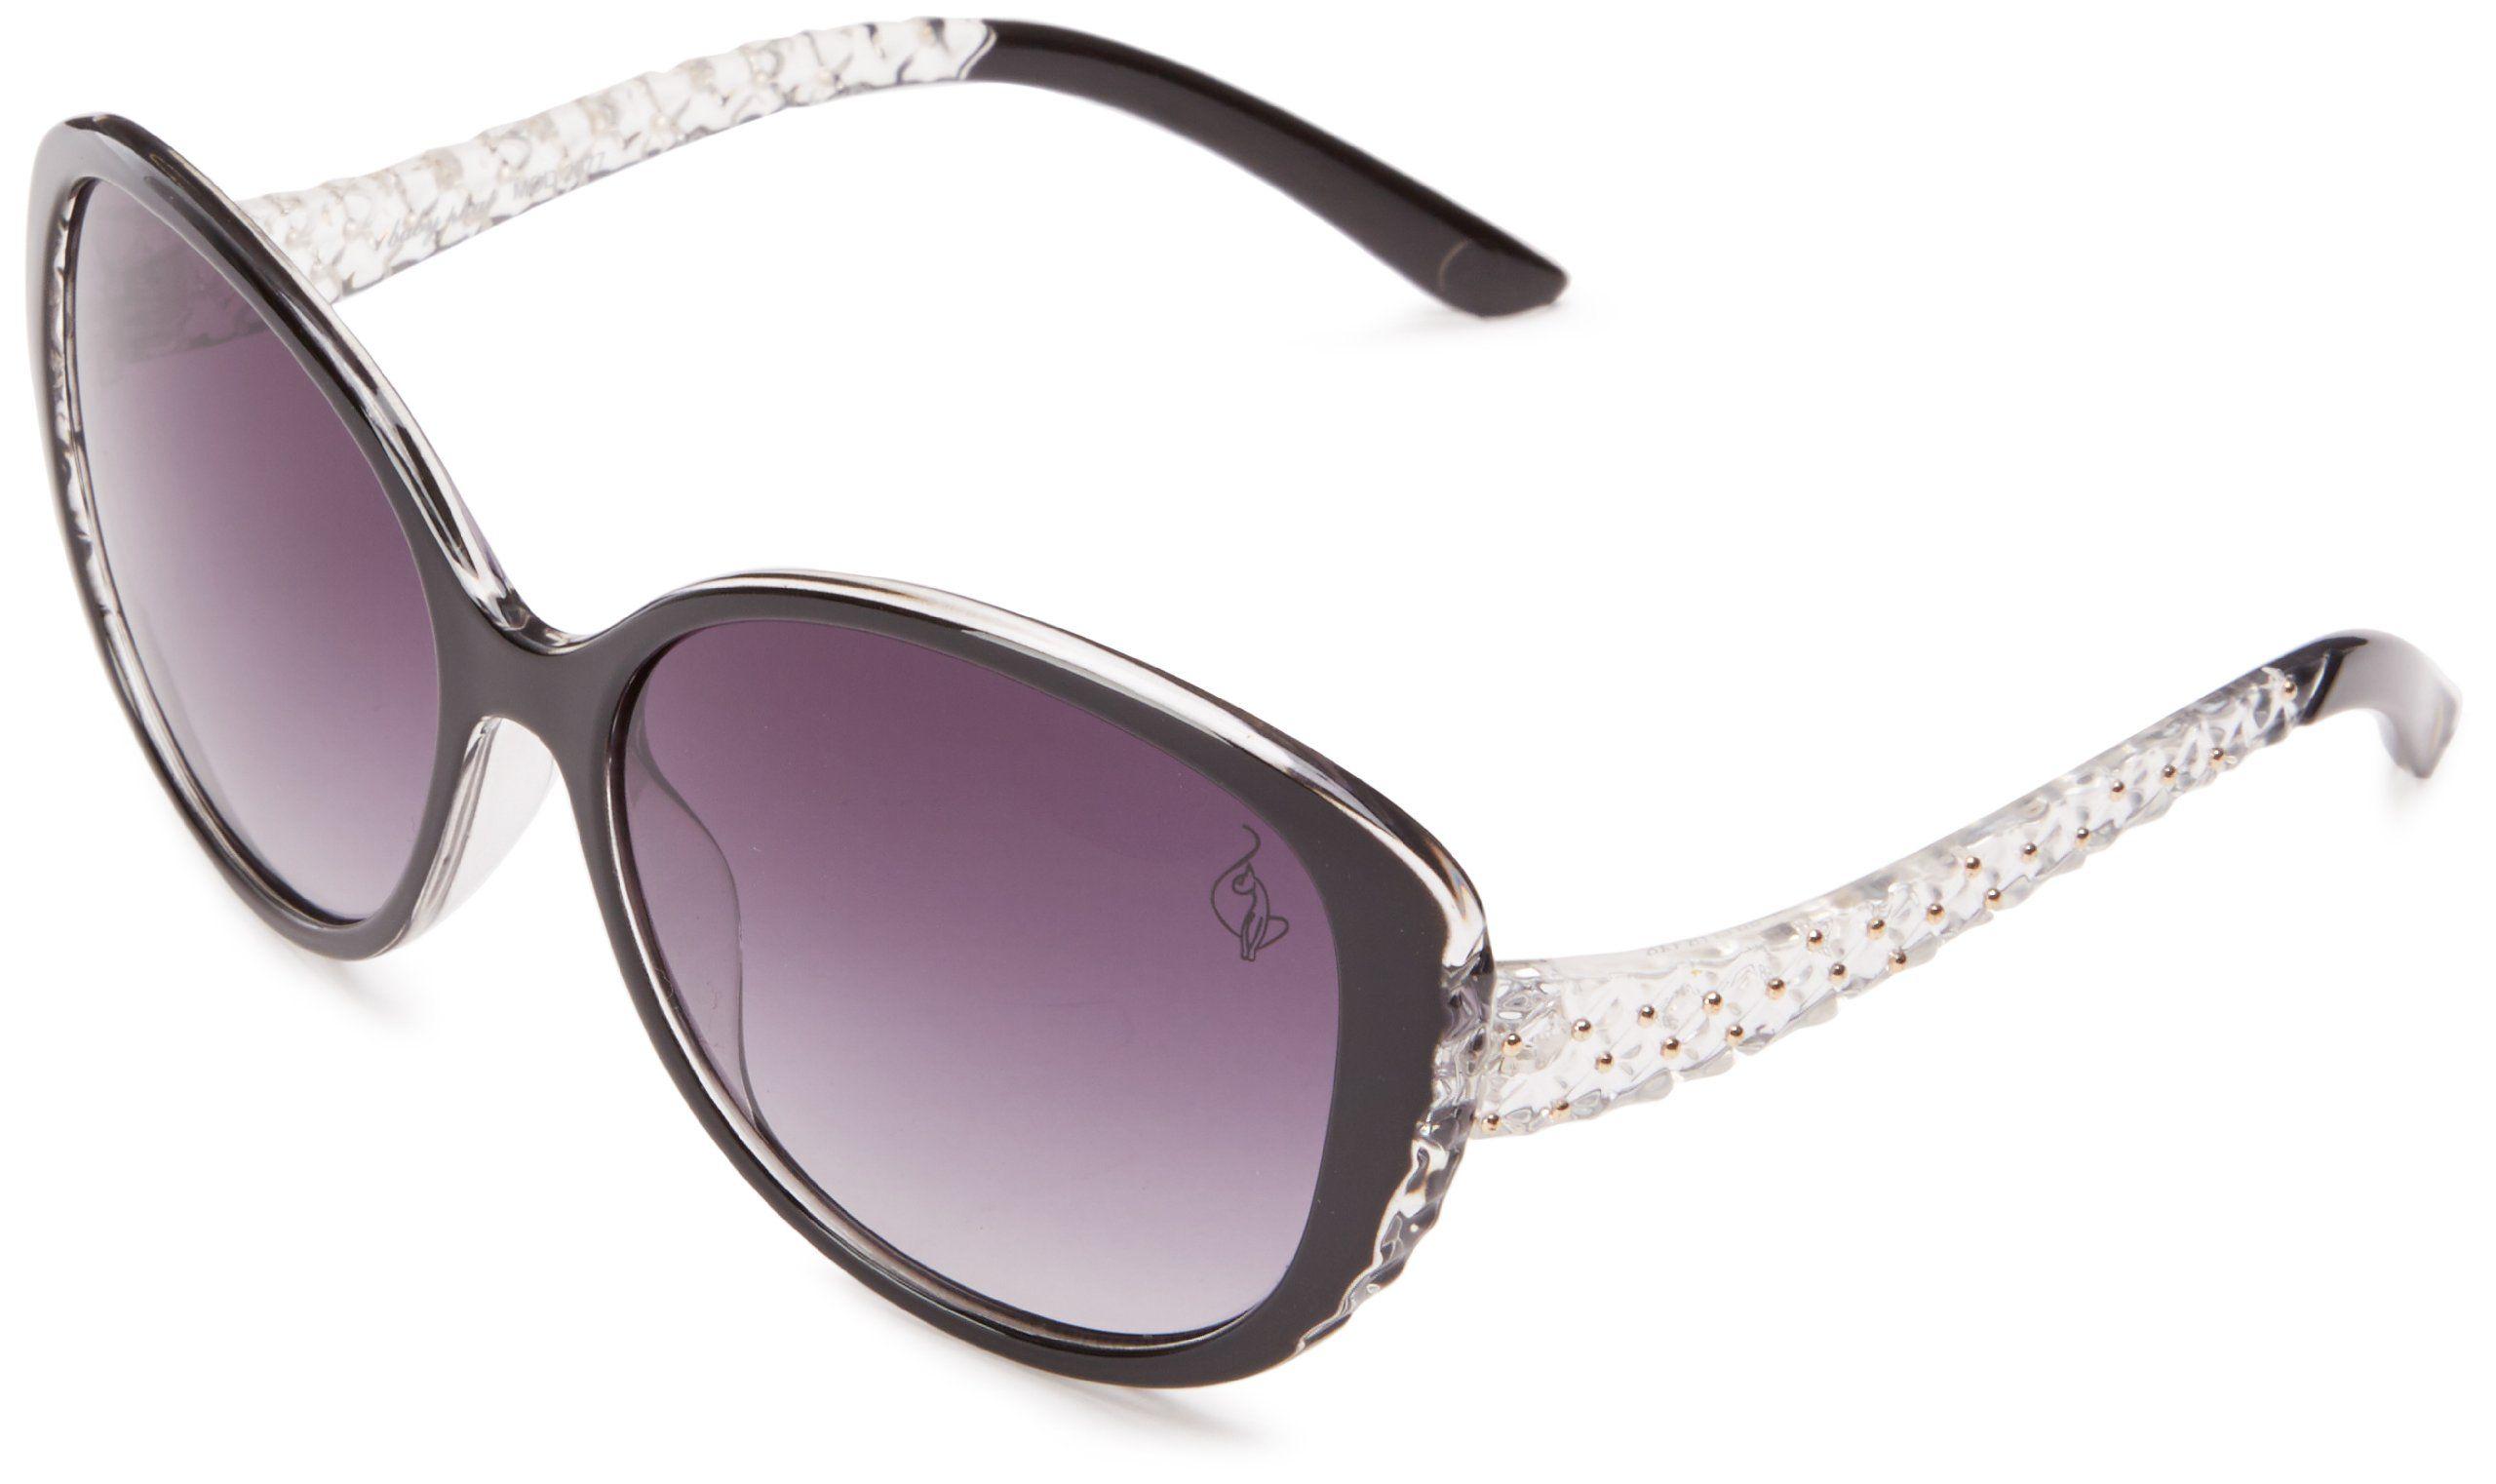 Amazon.com: baby phat 2077 Round Sunglasses,Black,58 mm: Clothing ...